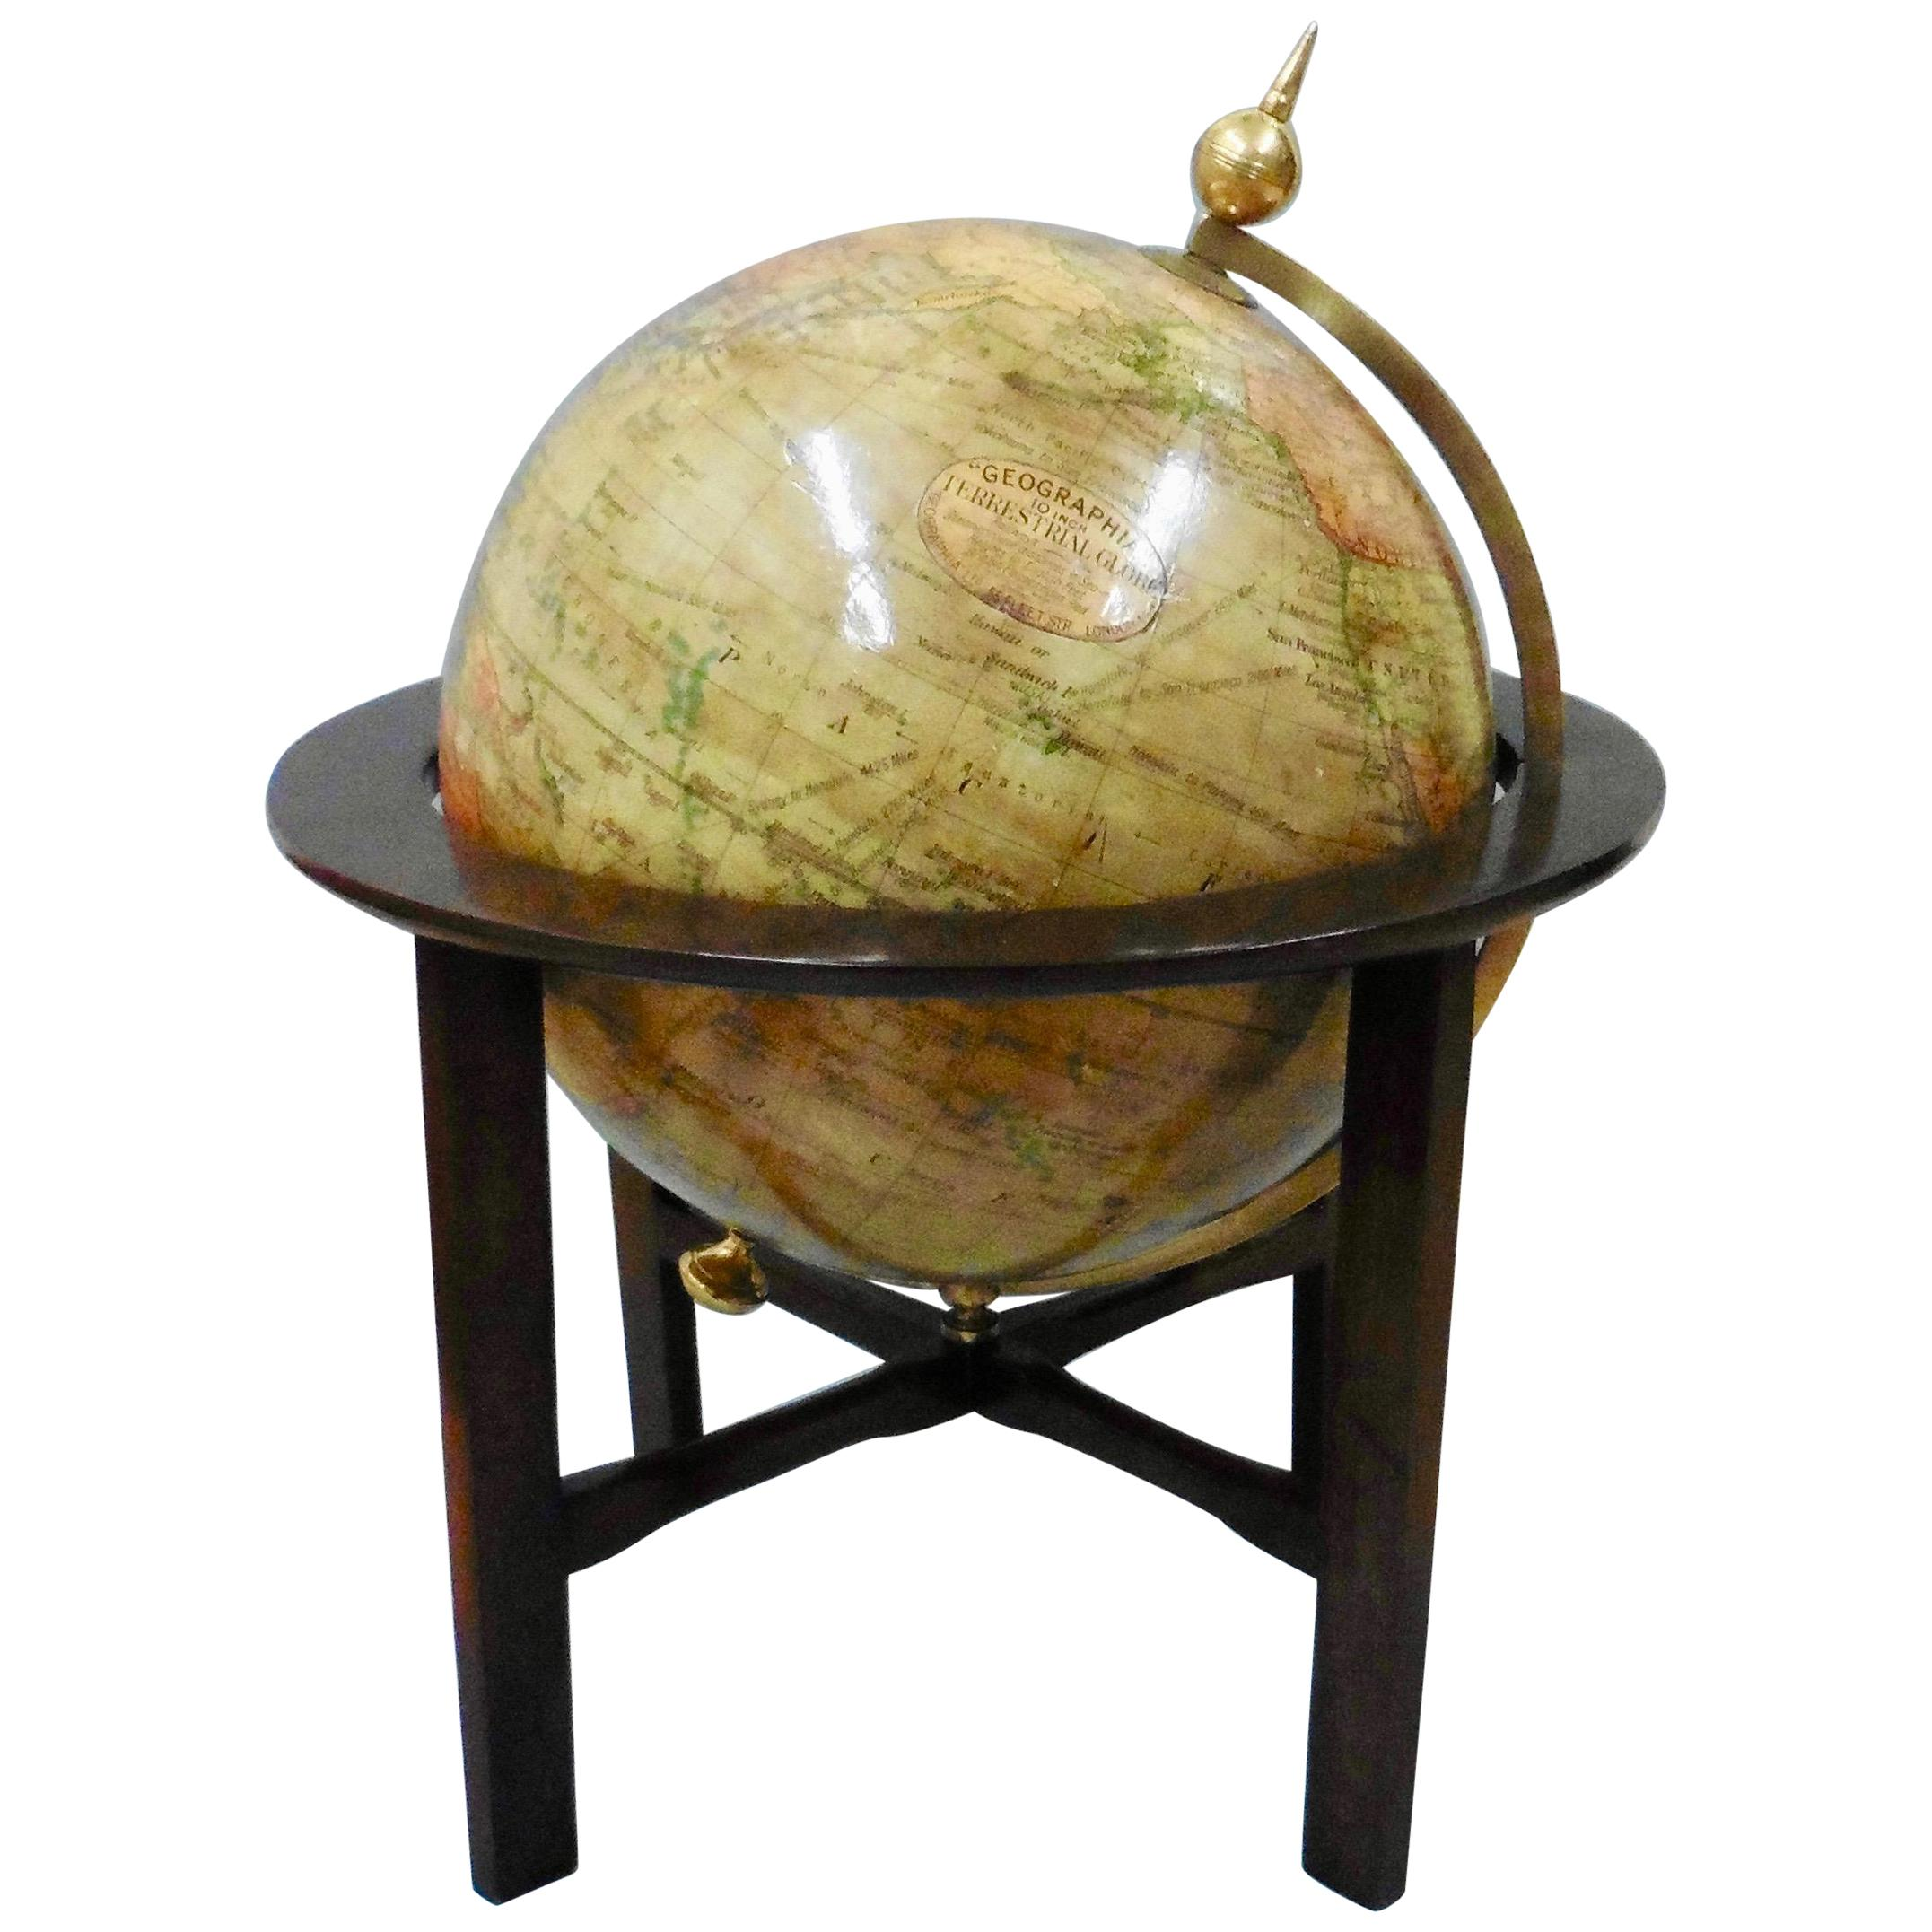 Edwardian Terrestrial Geographia Tabletop Globe